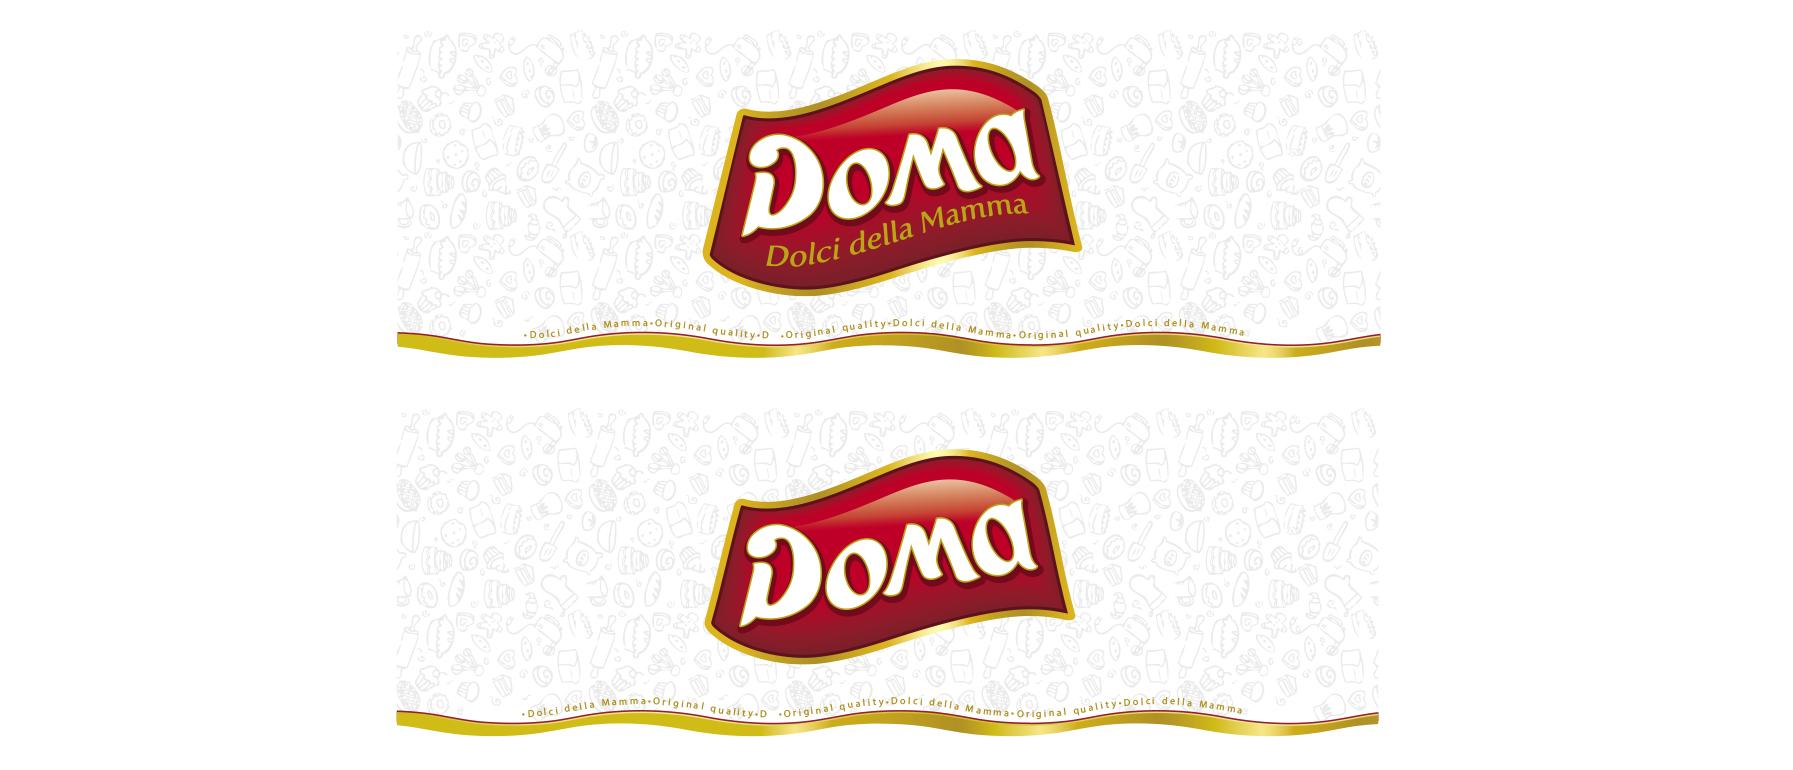 Визия Doma.